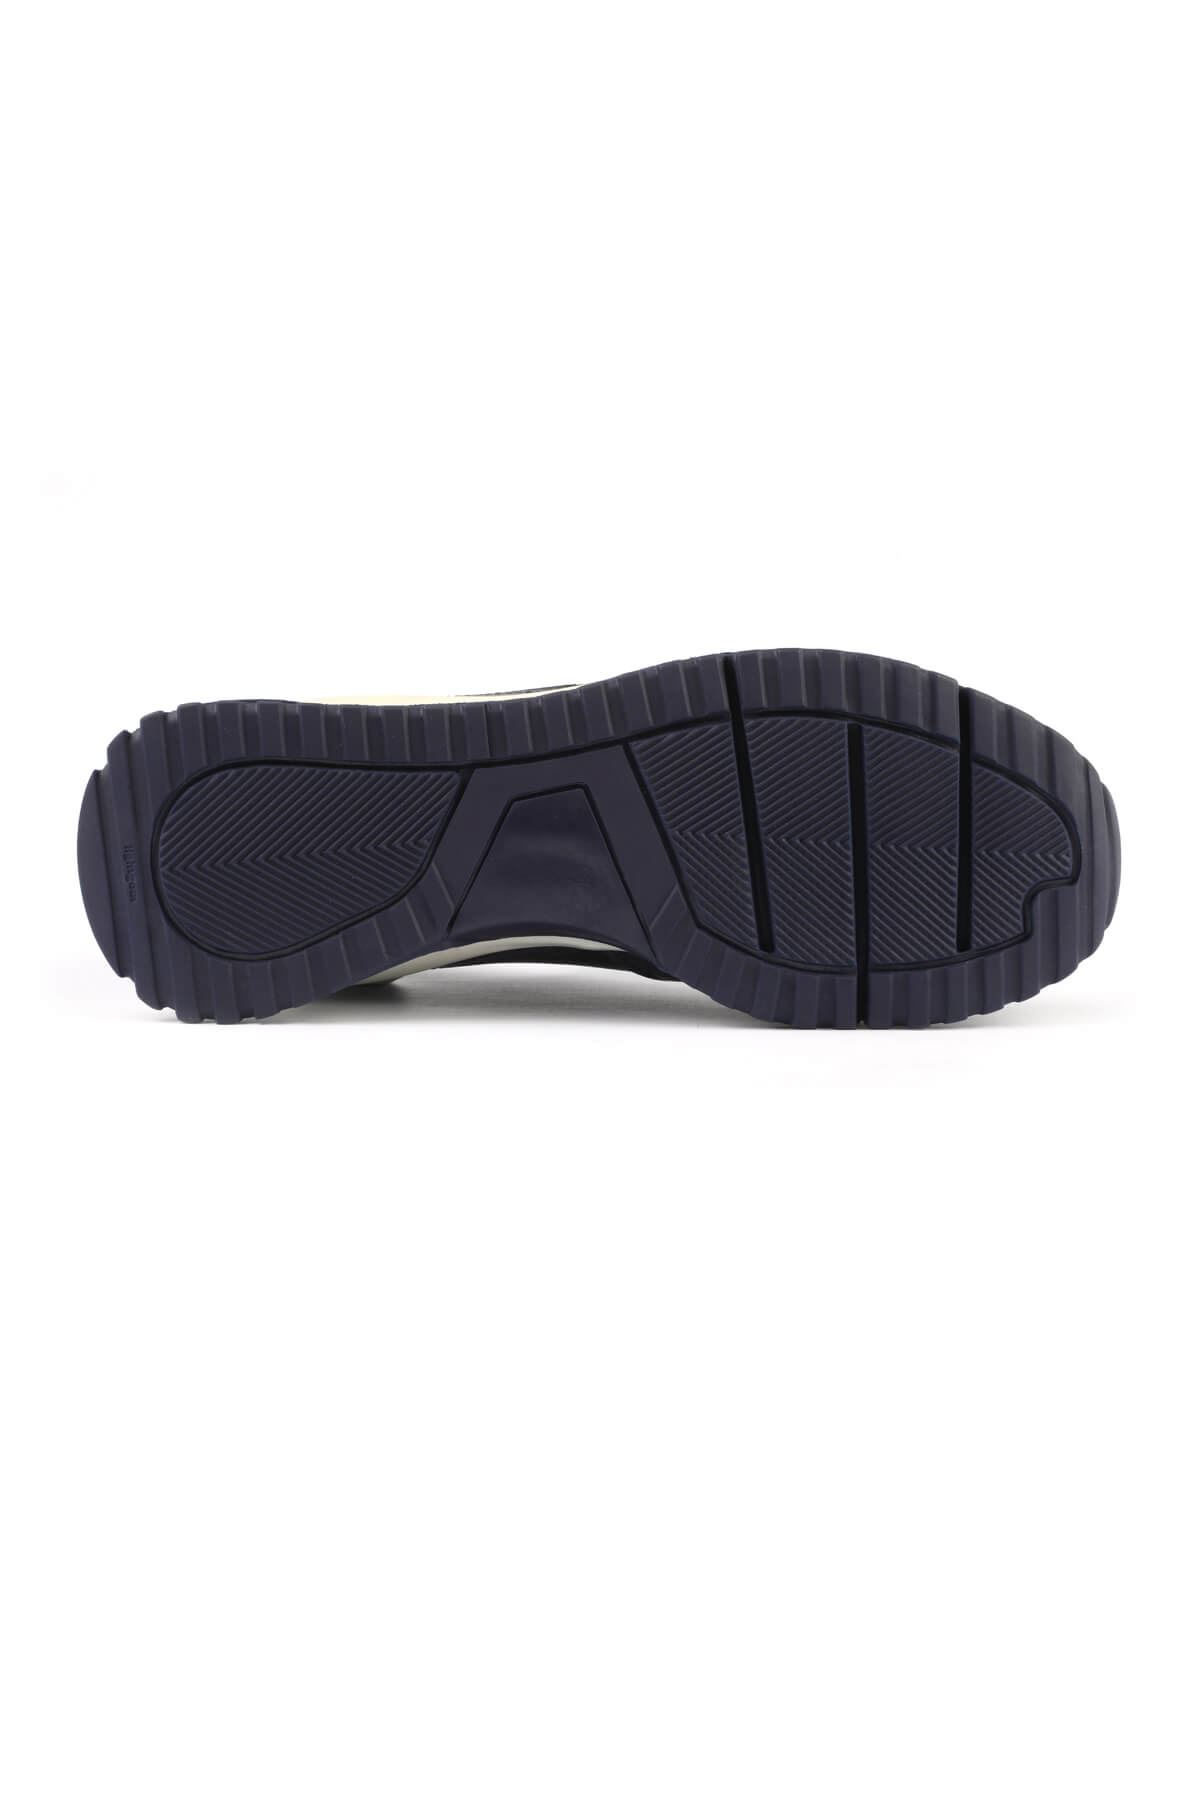 Libero 3152 Navy Blue Sports Shoes